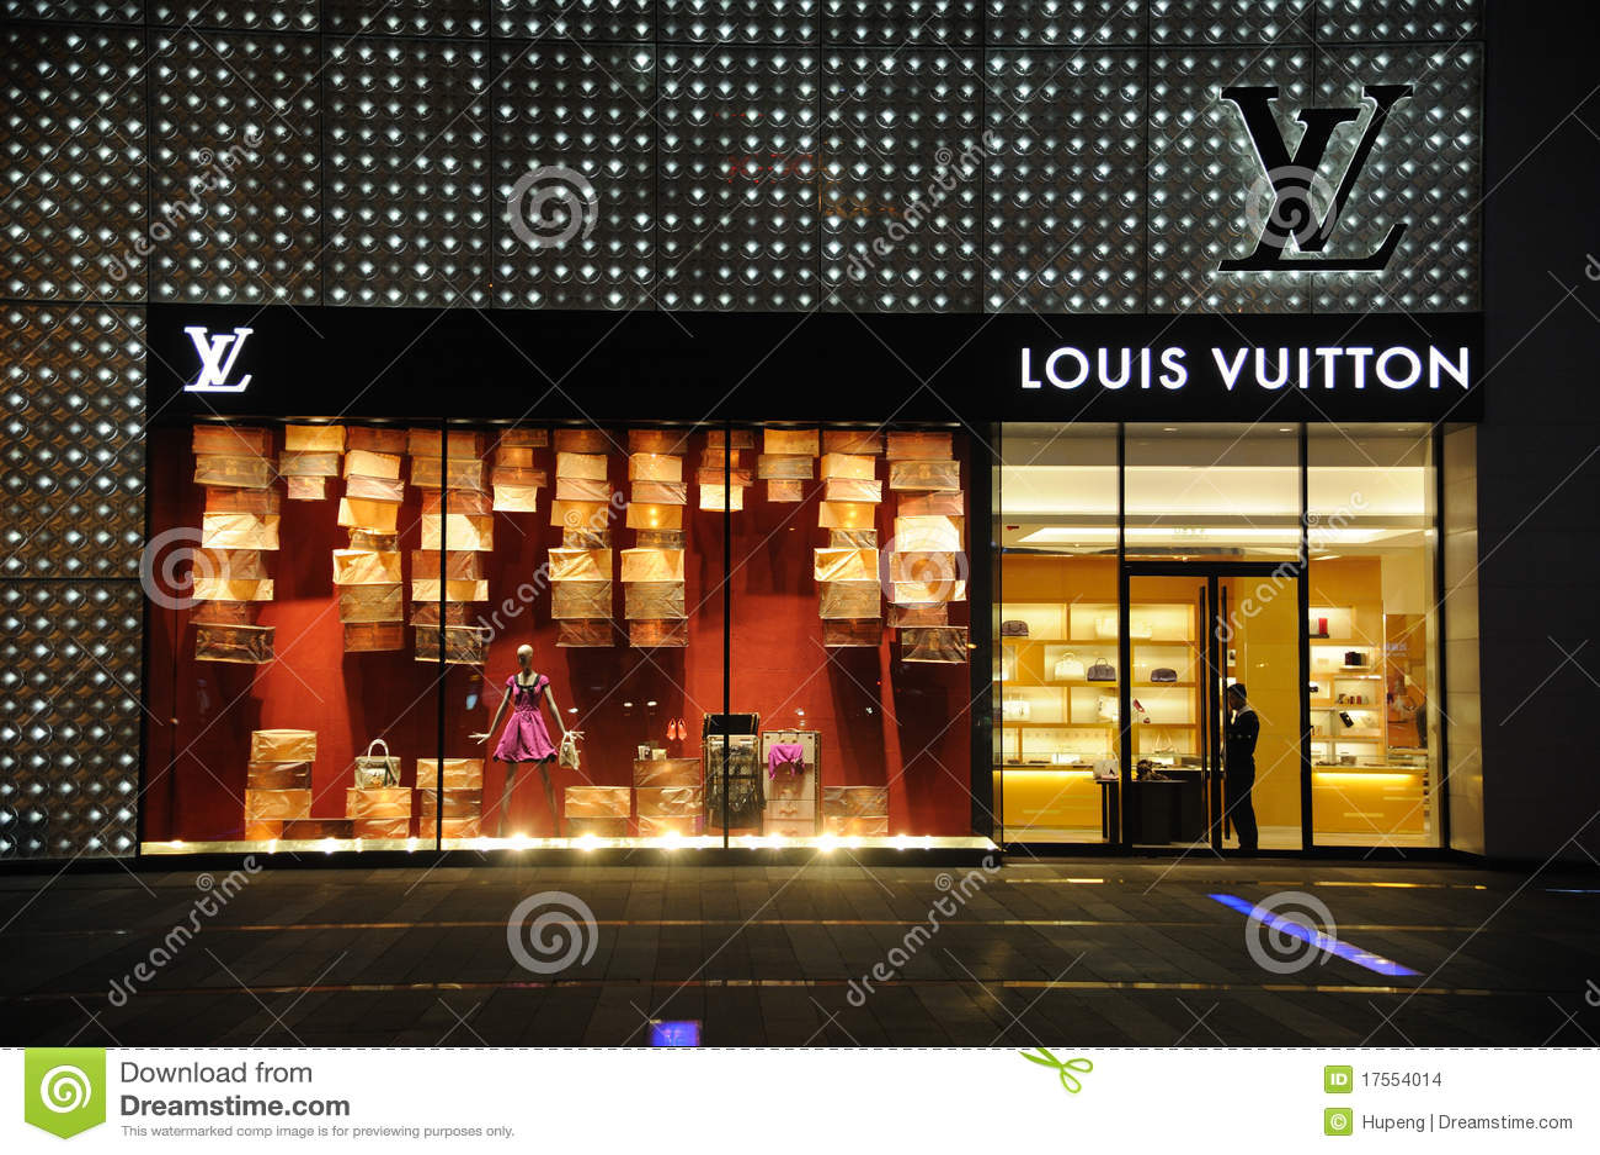 Louis vuitton arbeiten butike im chengduï ¼ sichuanï ¼ chinaã um